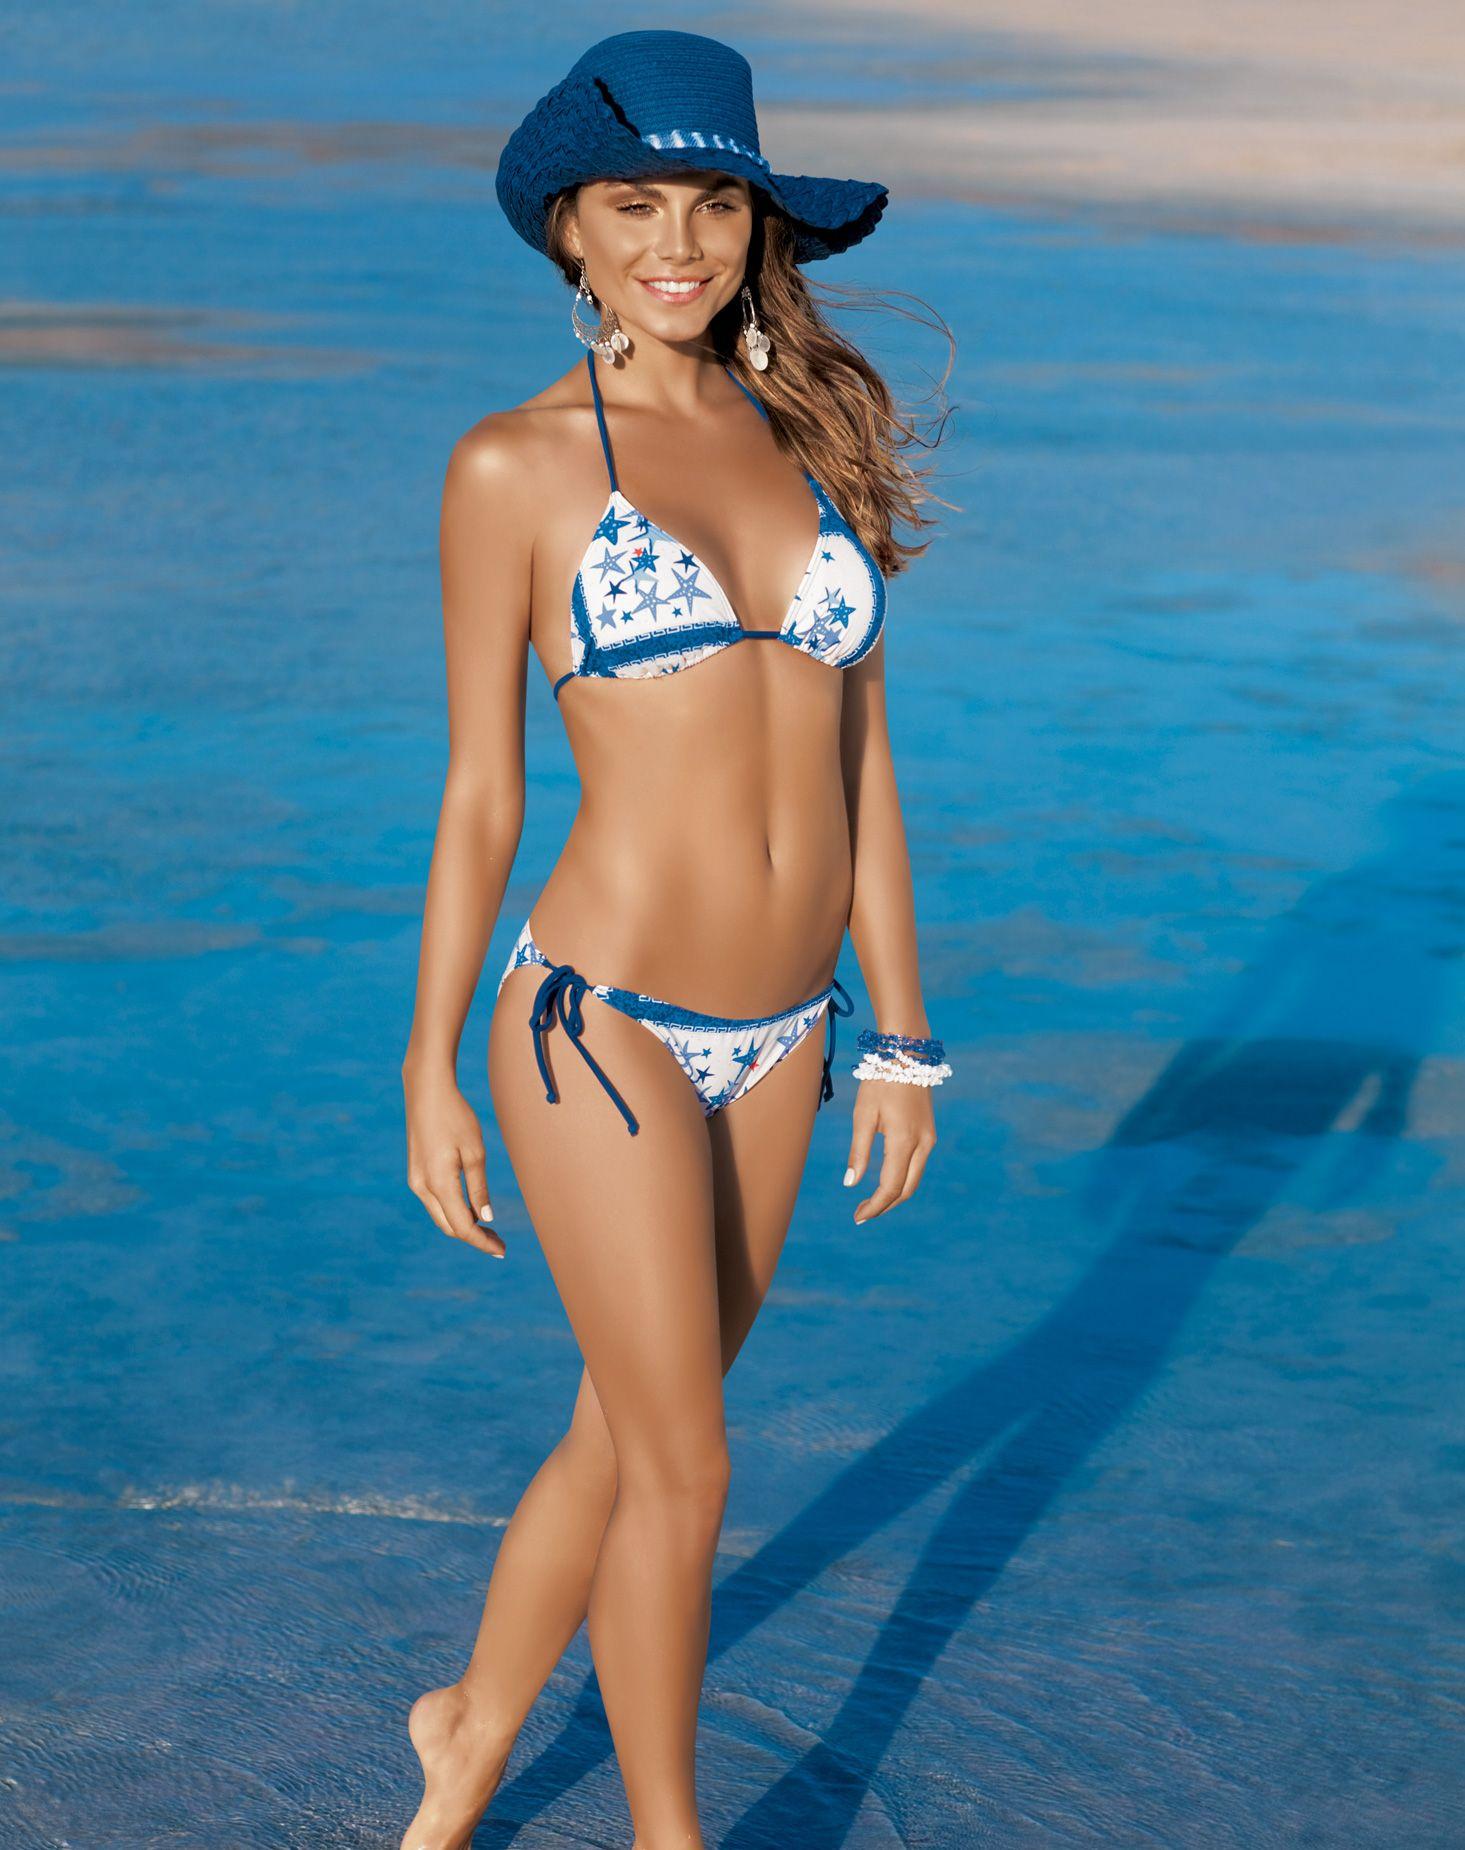 Bikini Marina Calabro nude photos 2019